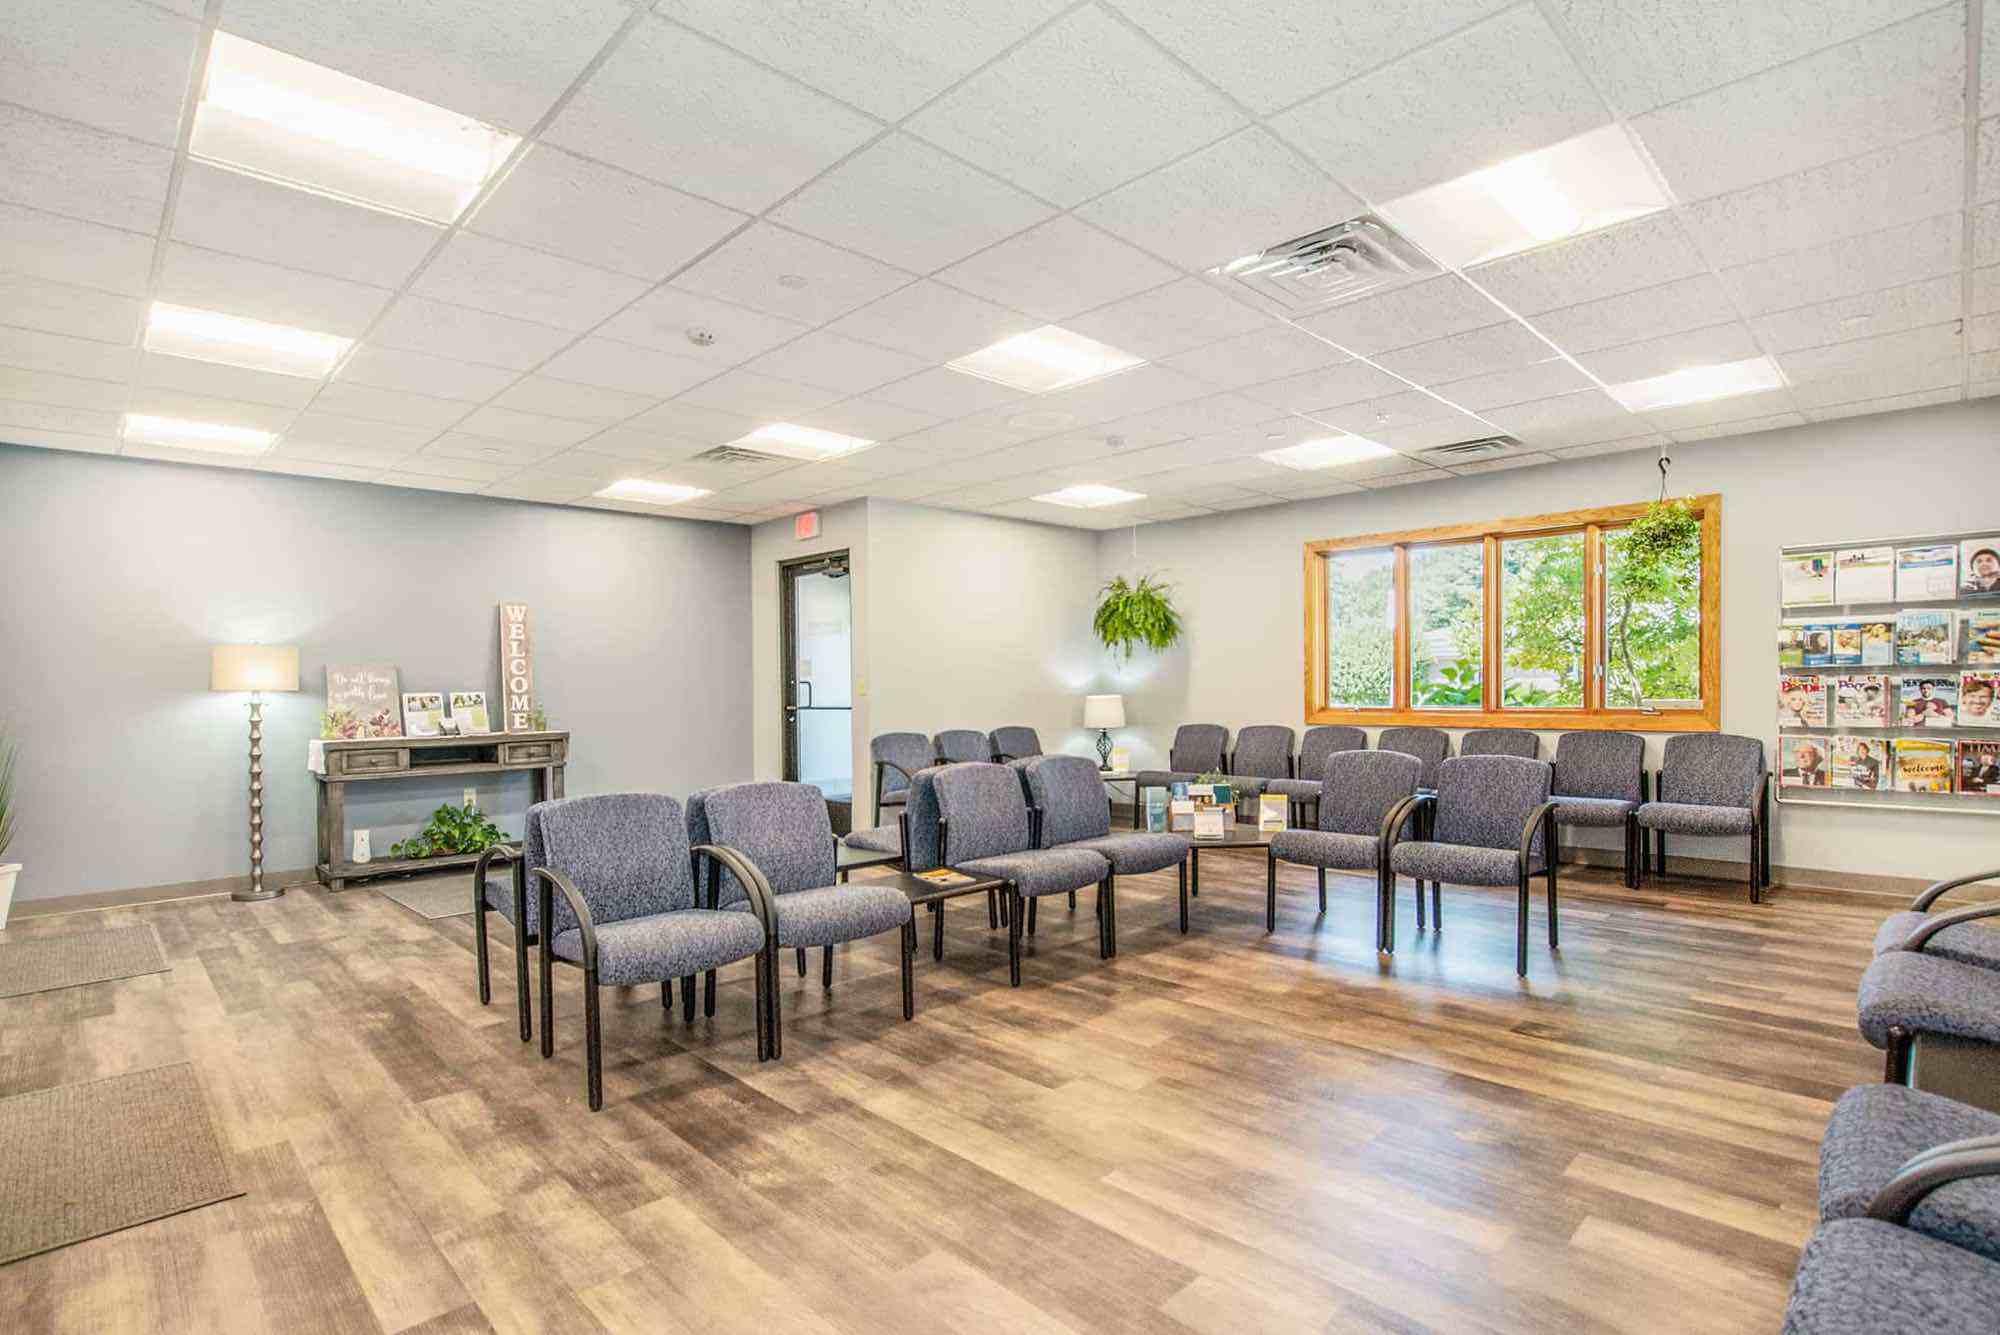 Holland Clinic theraoy lobby